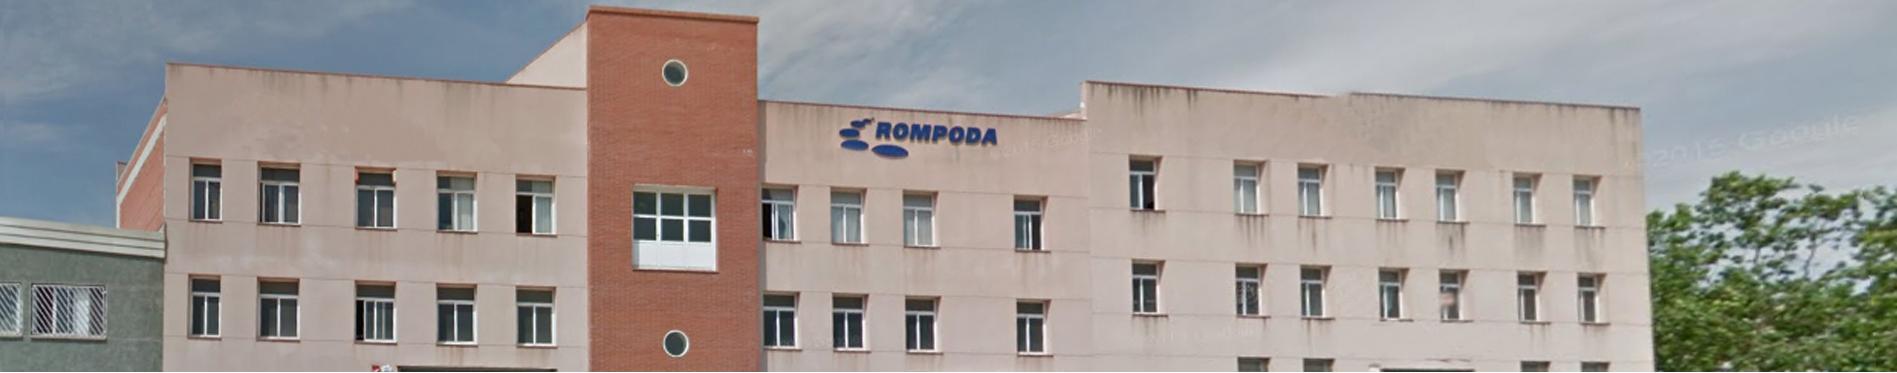 Rompoda